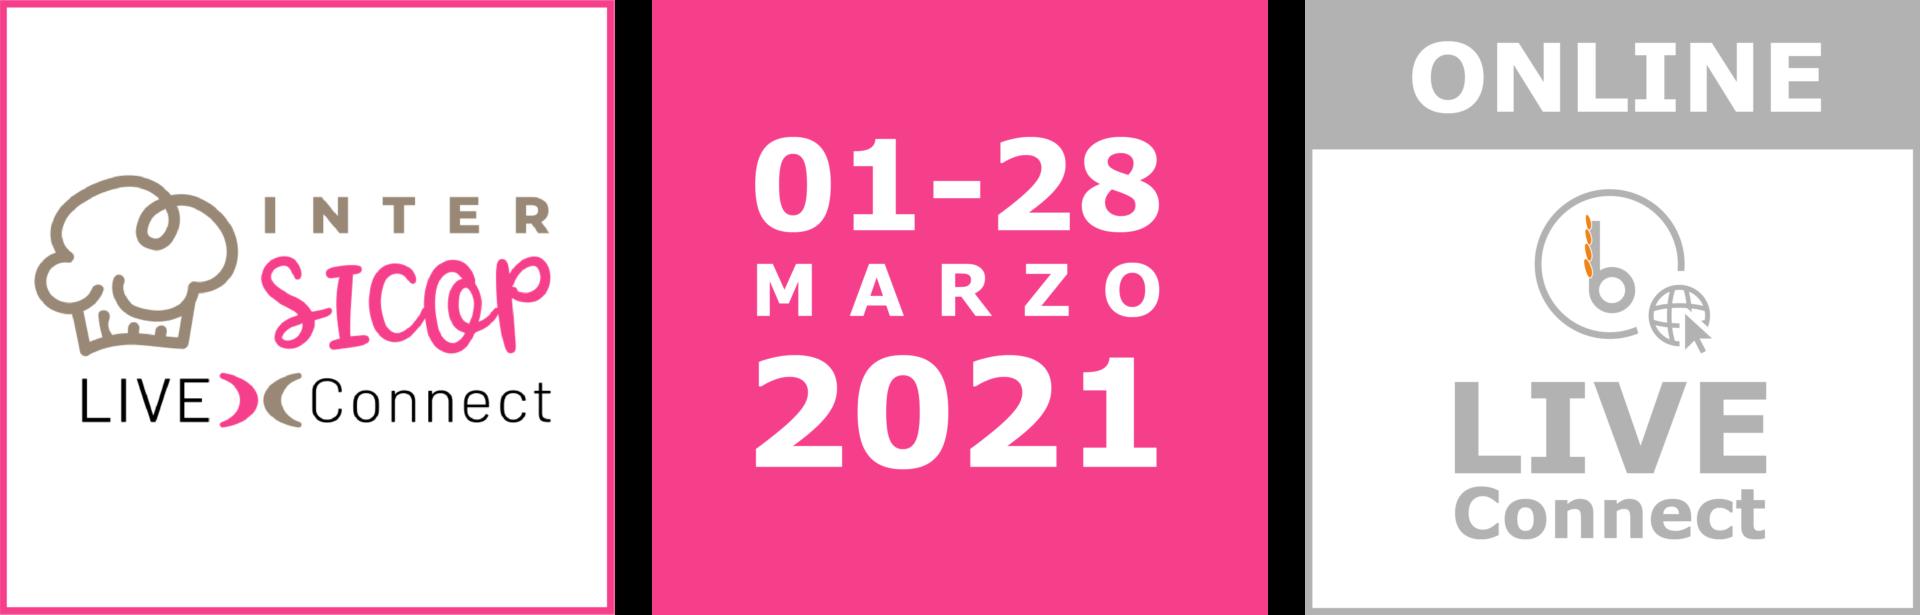 InterSICOP LIVEConnect 2021